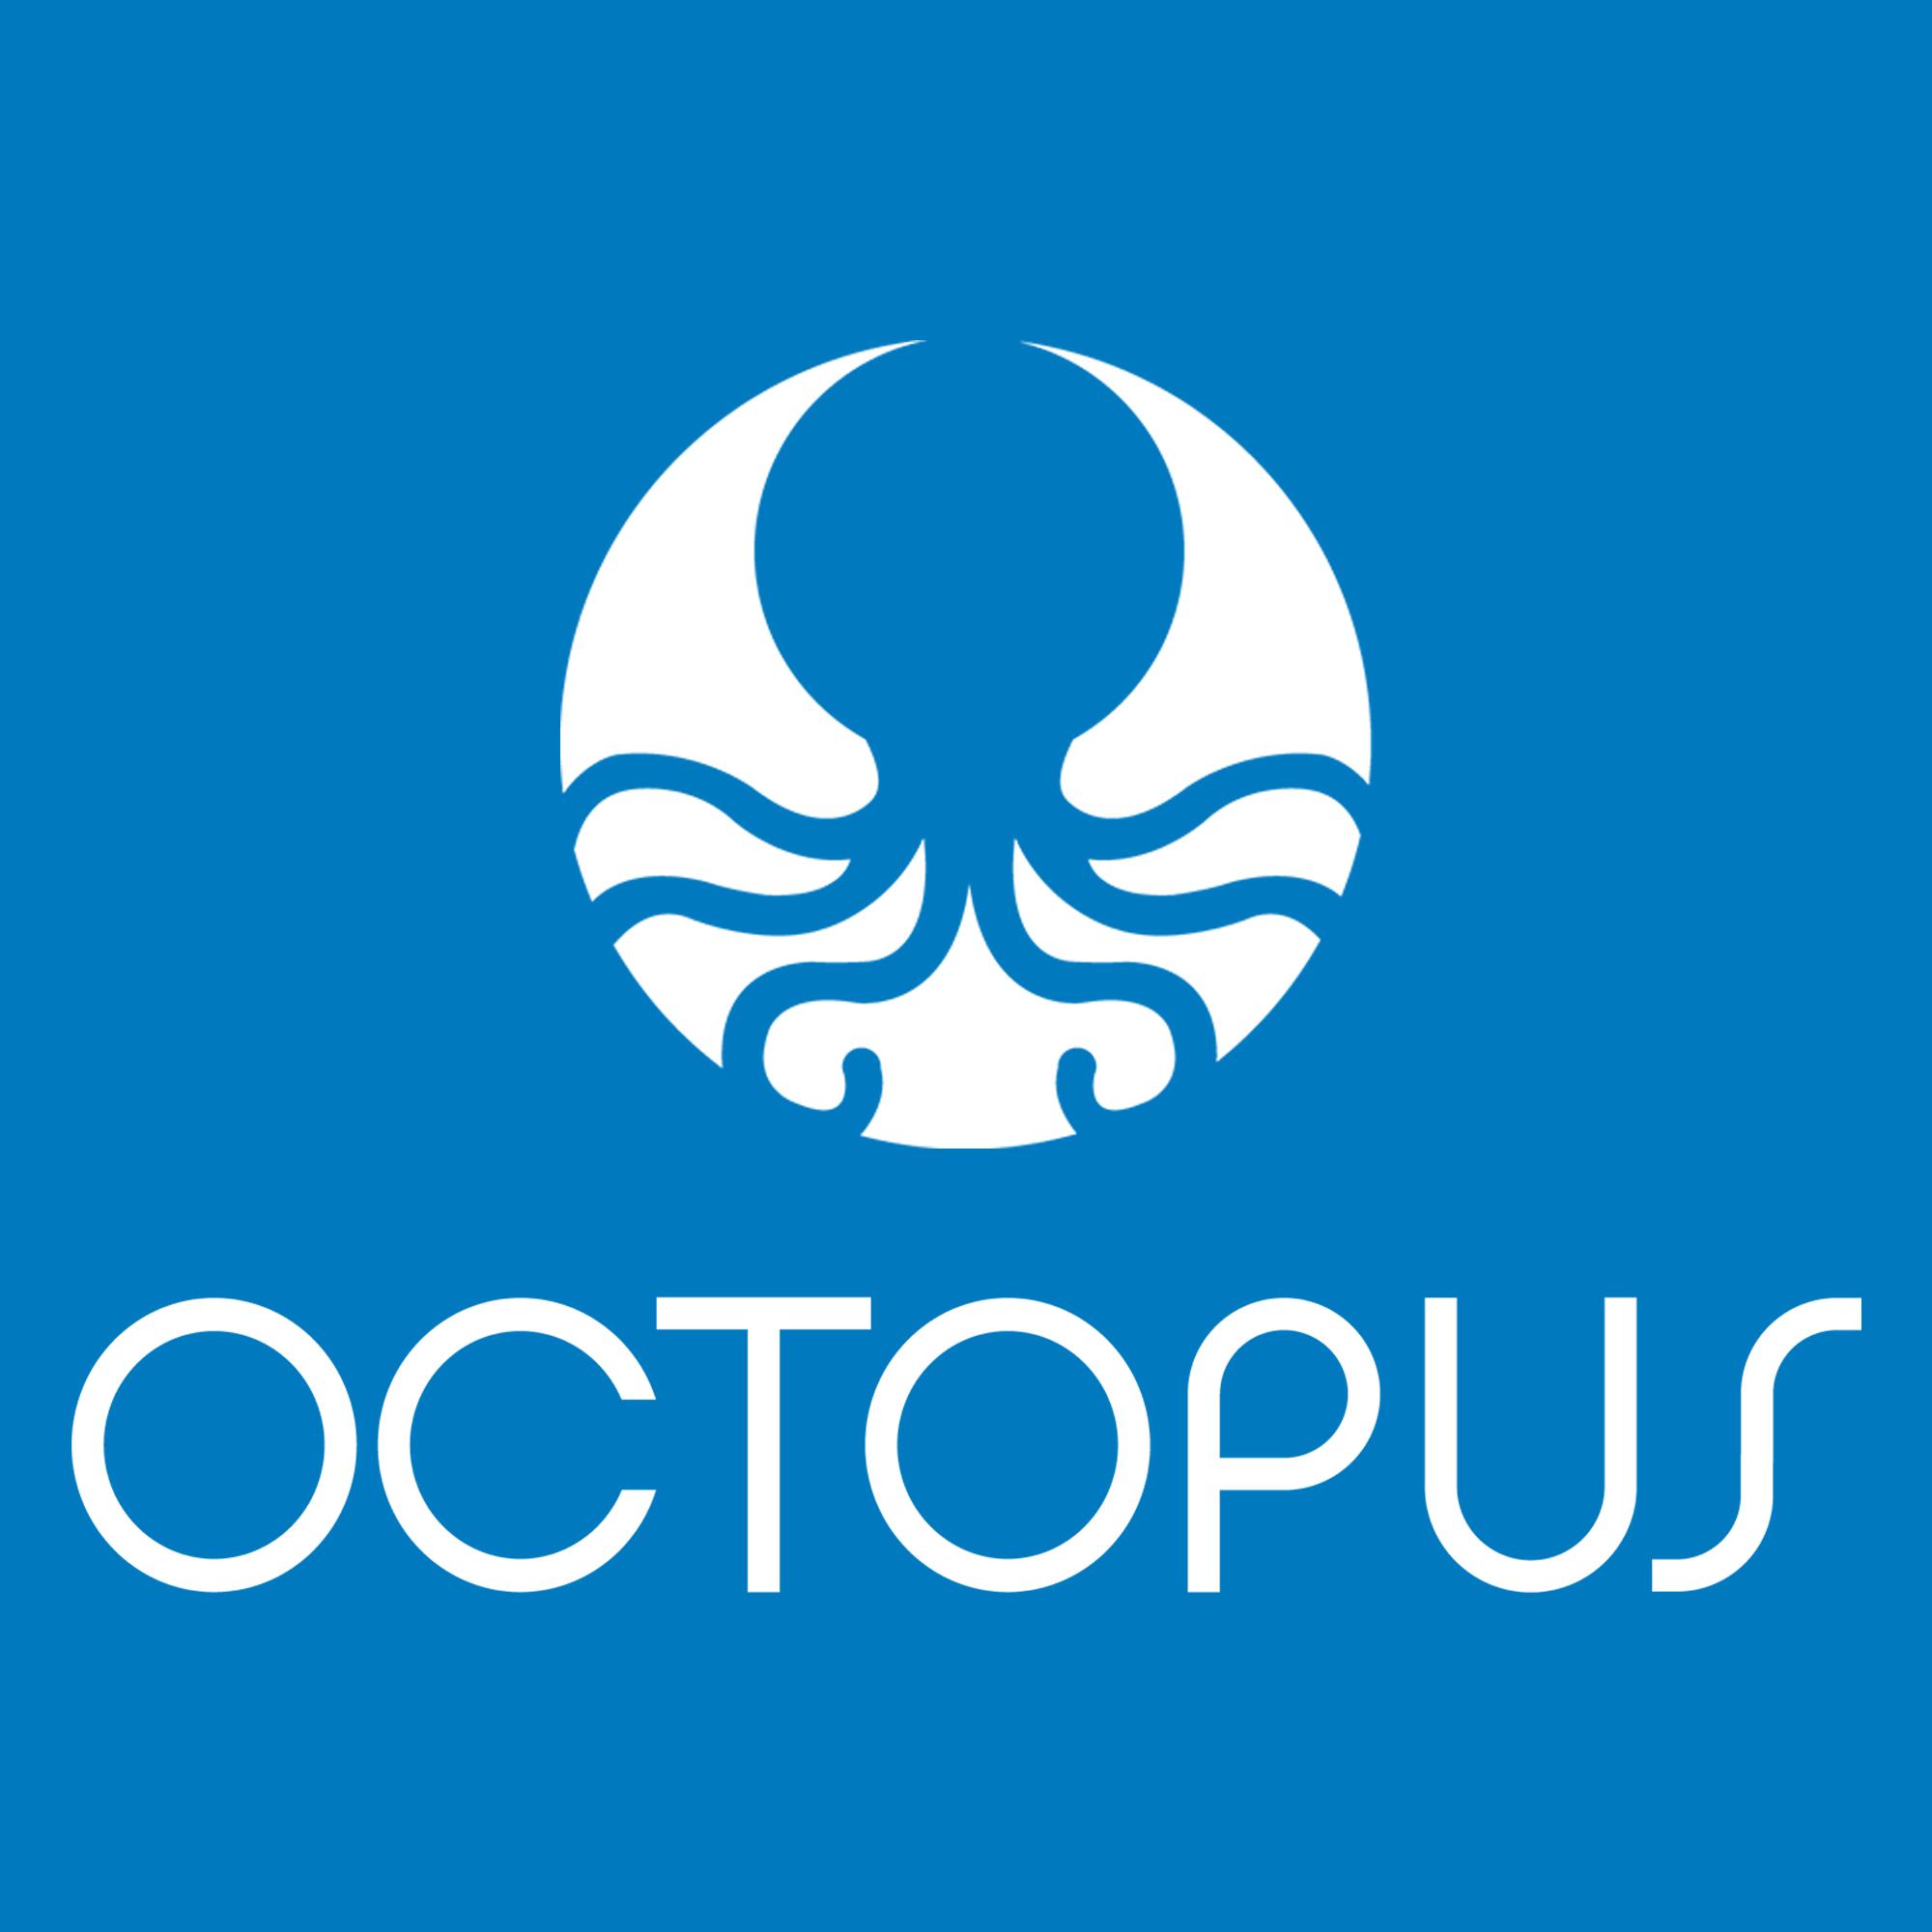 octopus pms